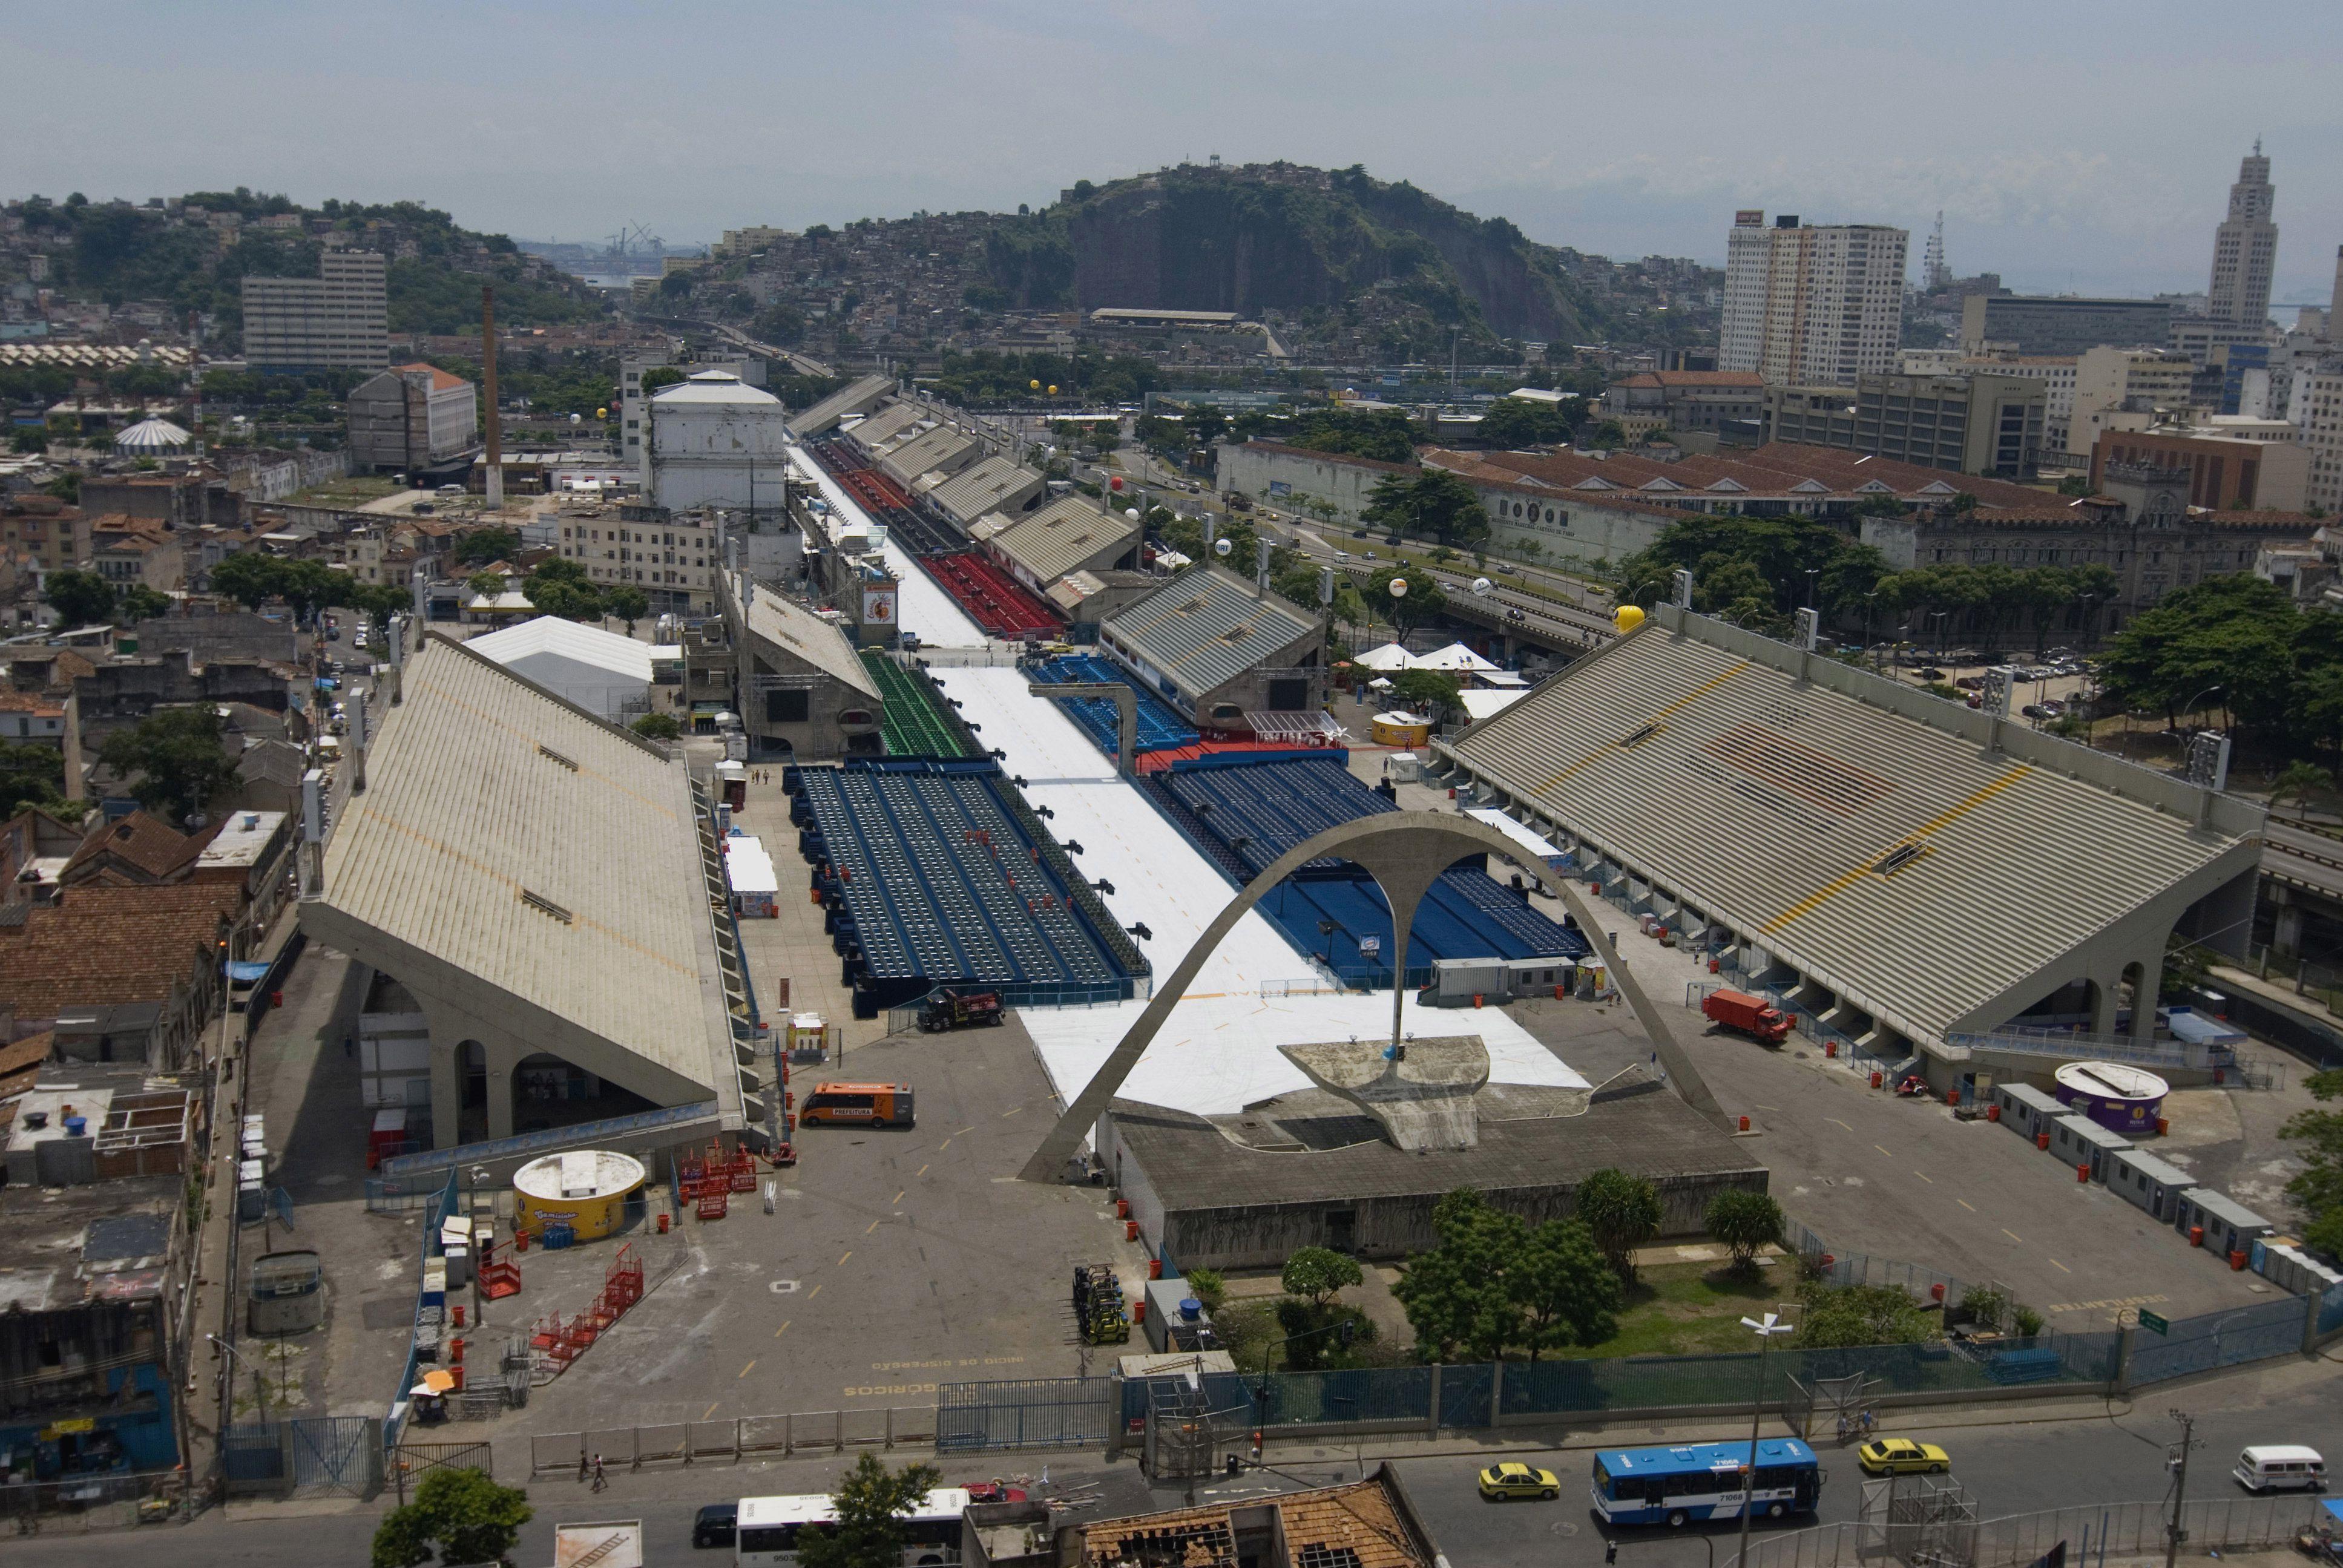 Oscar Niemeyer designed Sambadrome, Carnival parade ground in Rio de Janeiro, Brazil